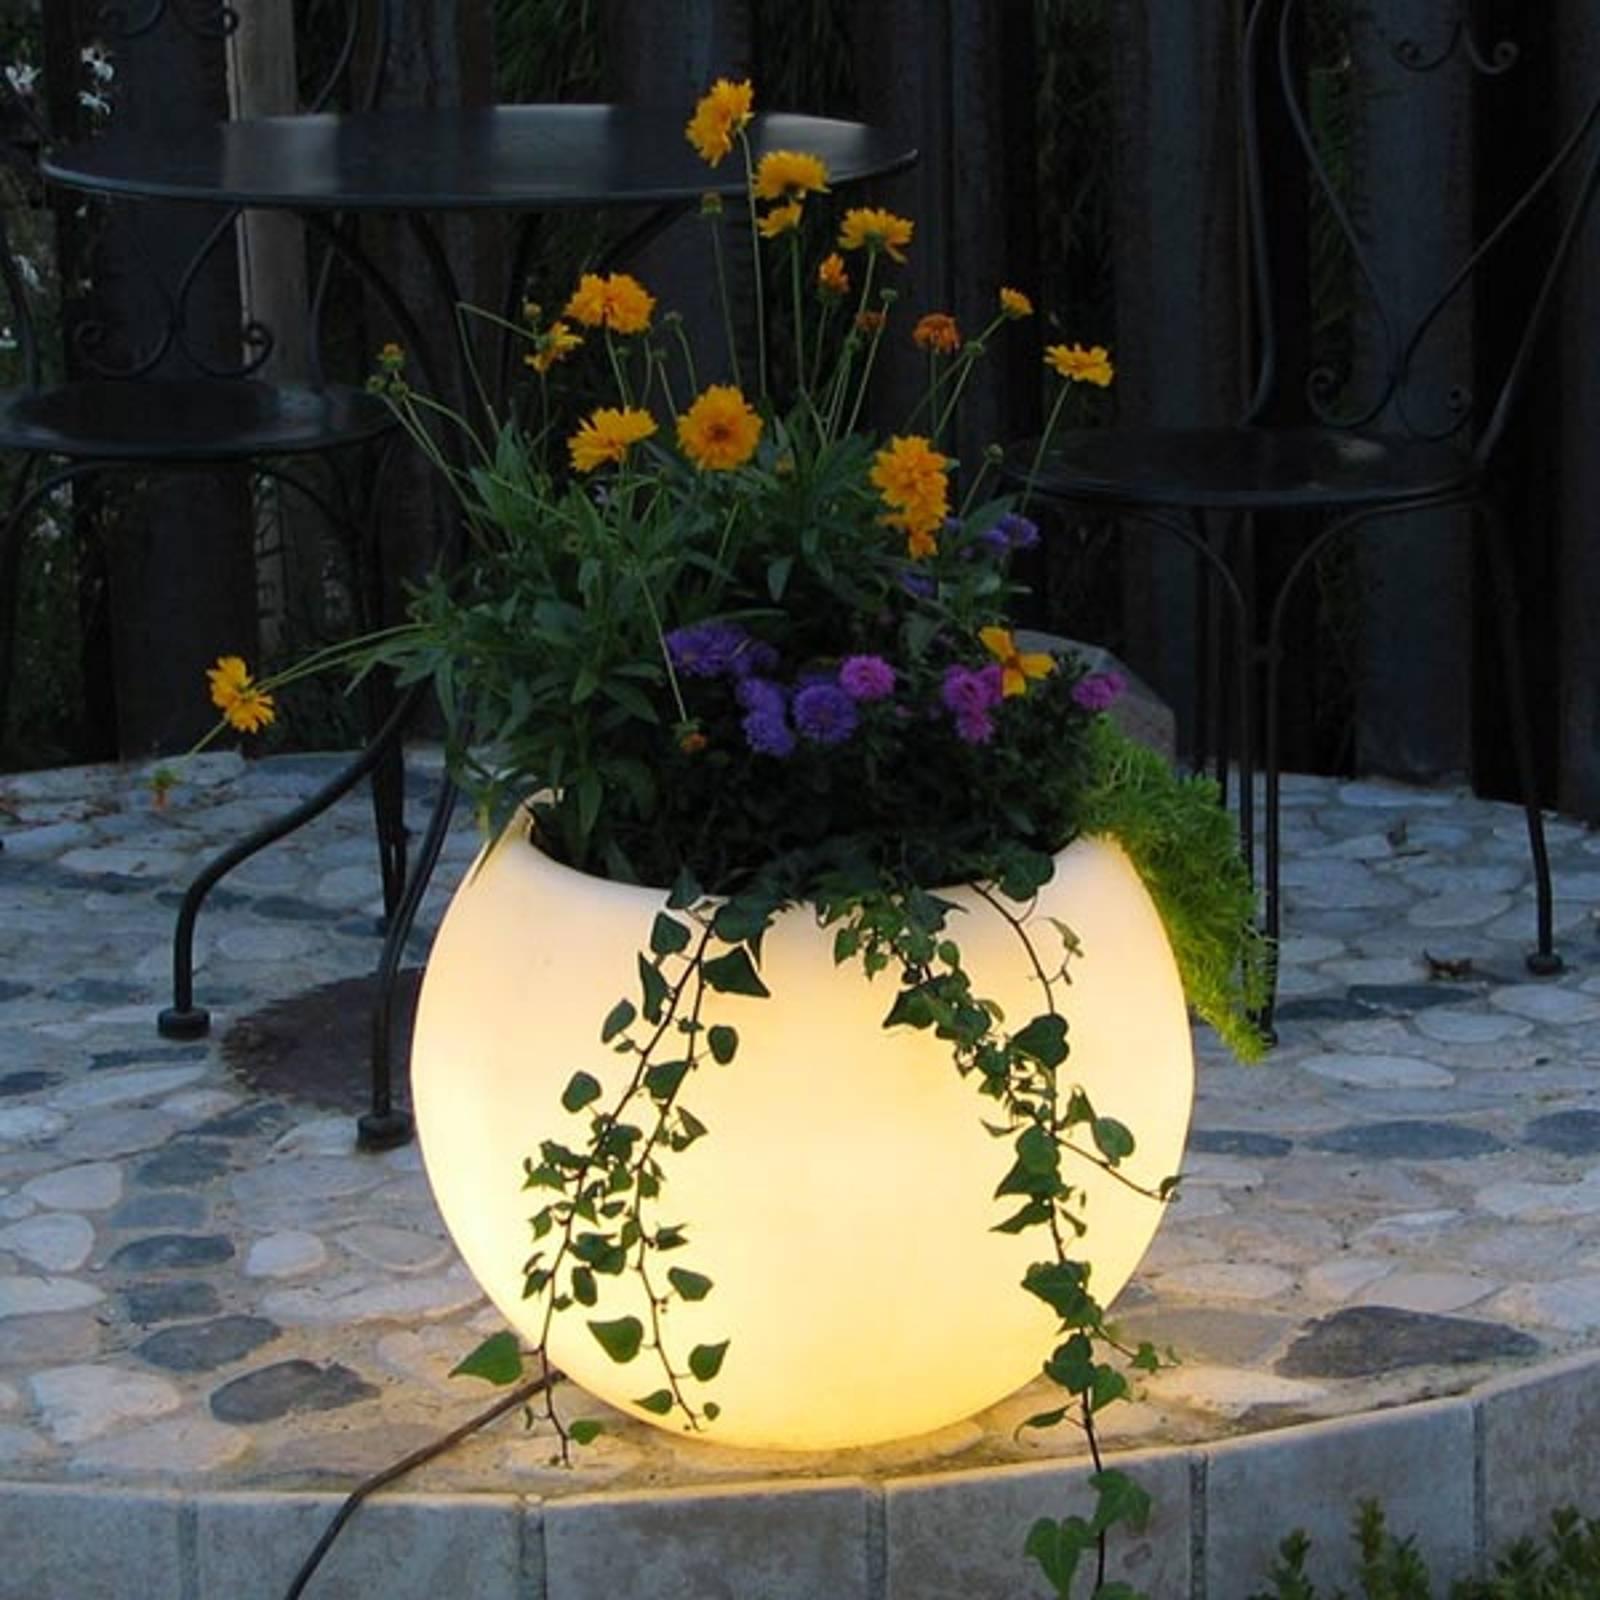 LED-kukka-astia Flora, akku ja kaukosäädin, RGB